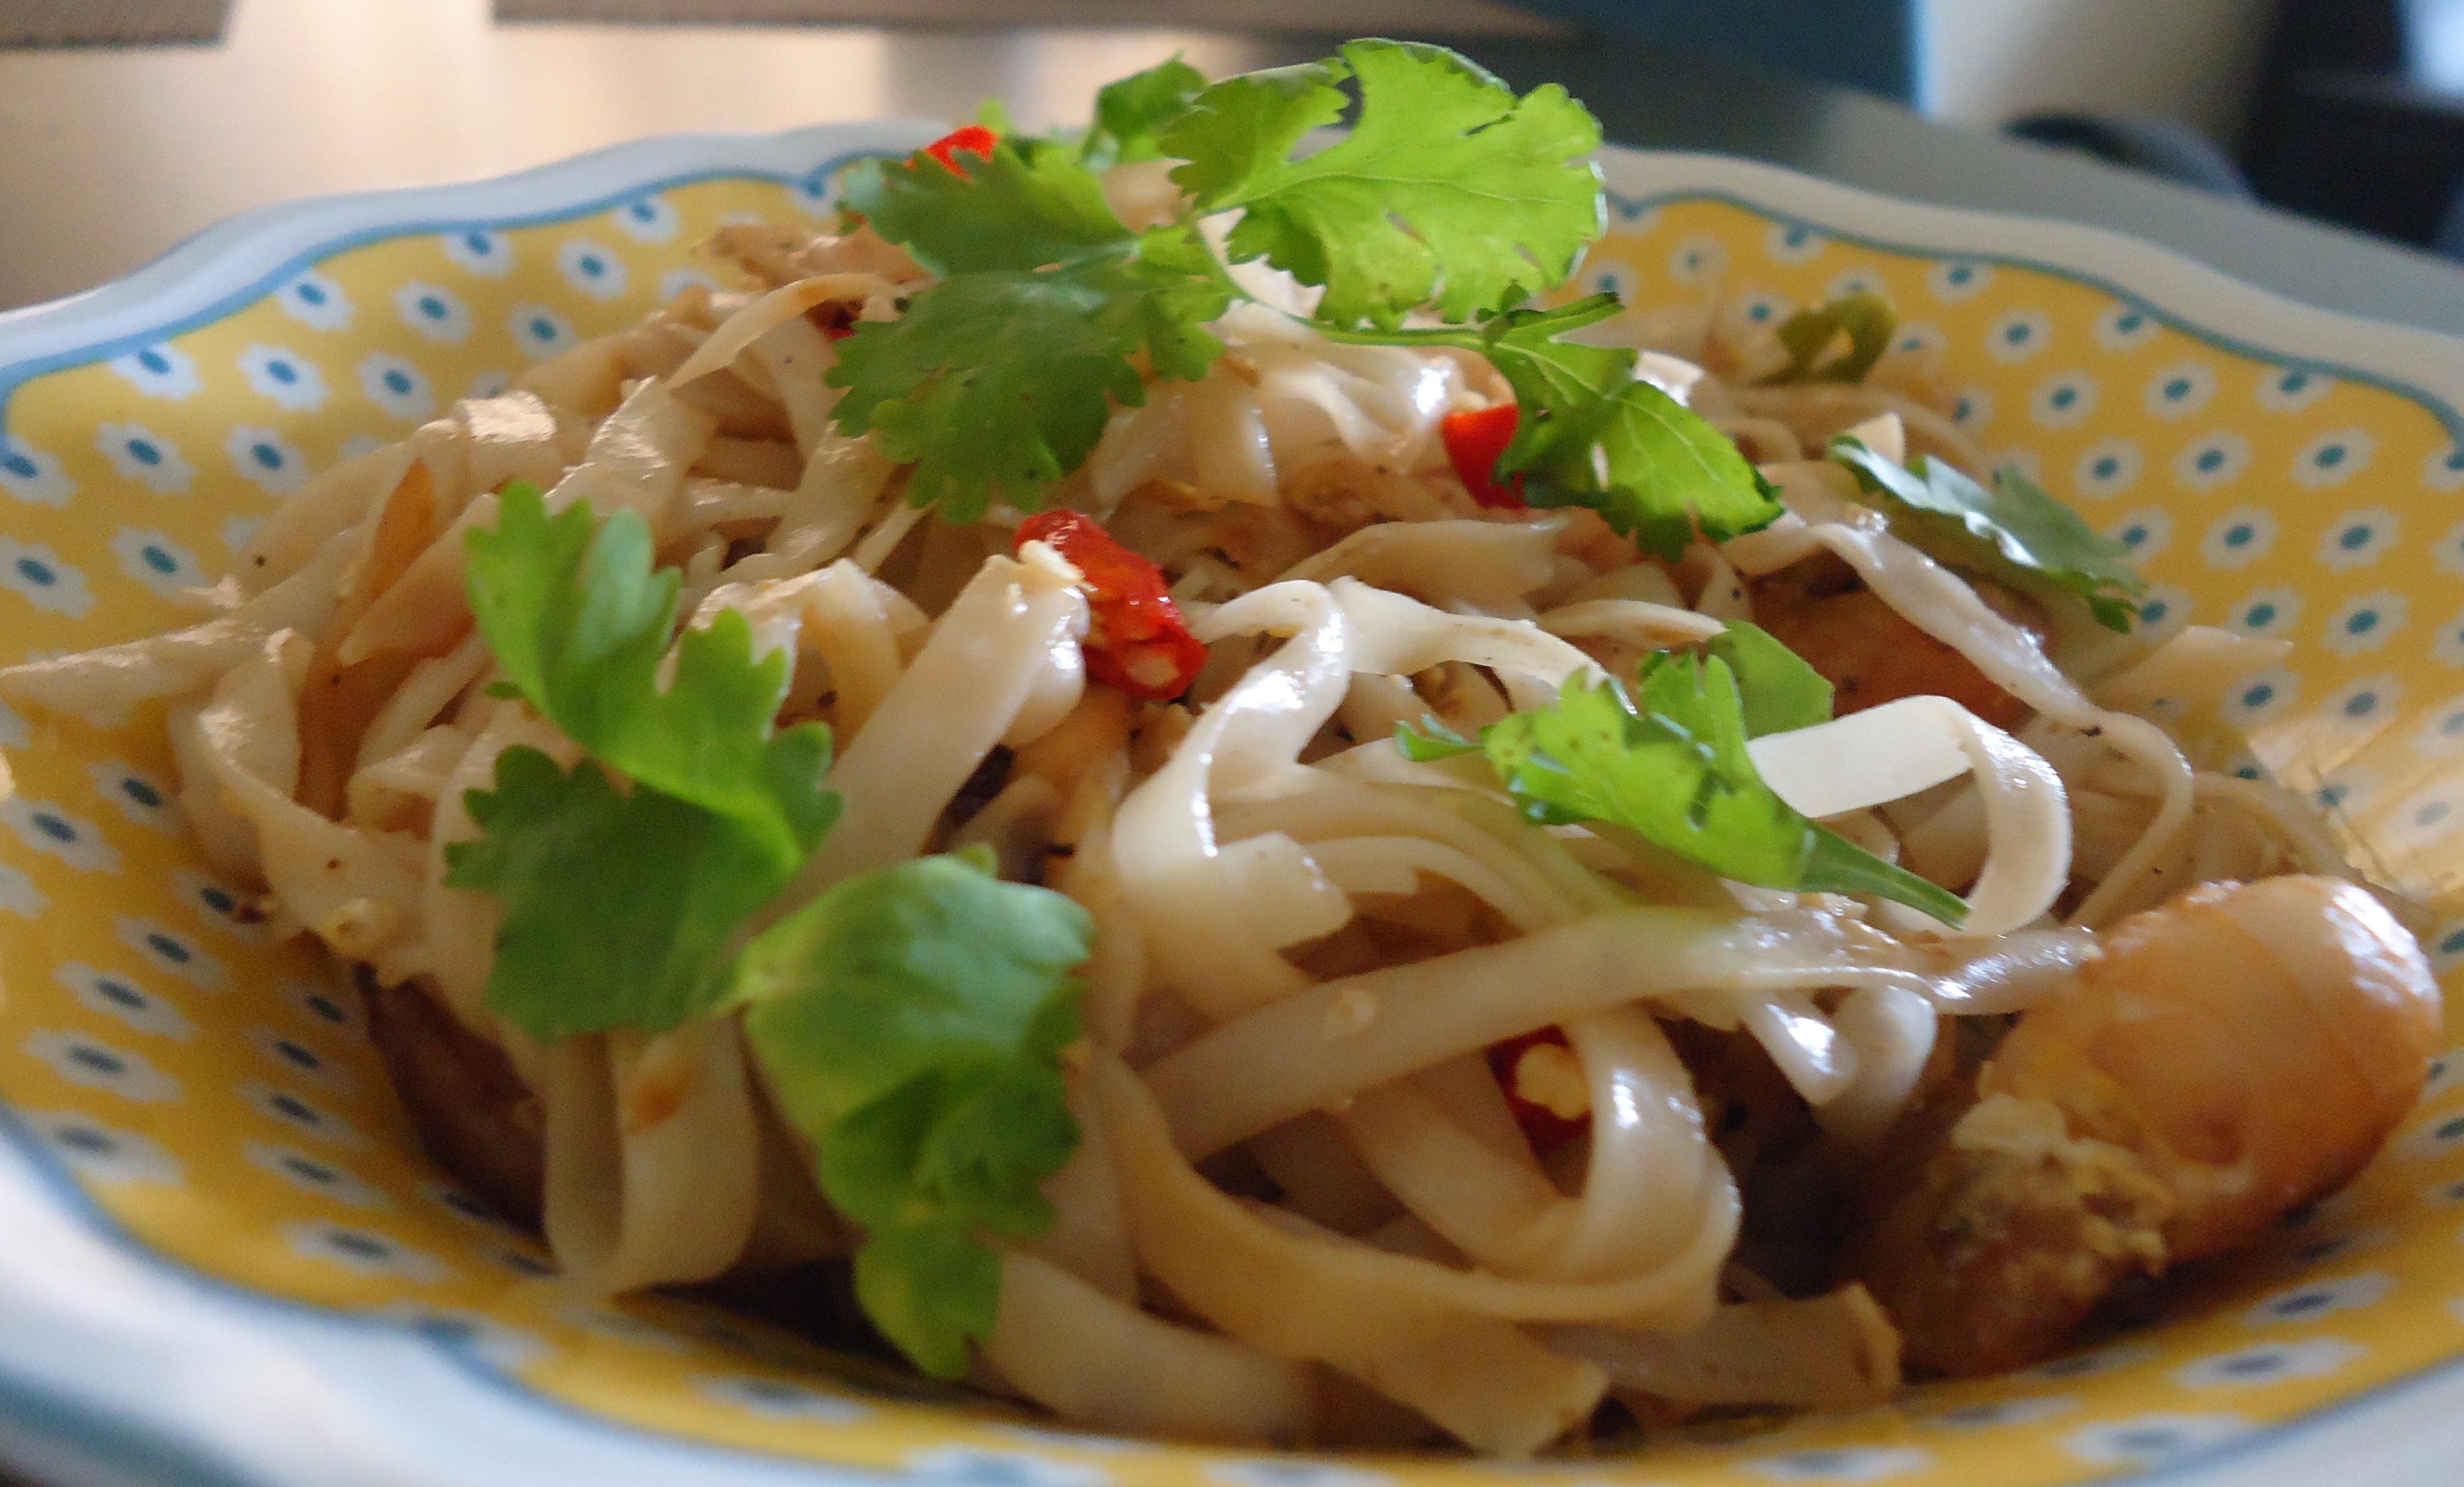 Pad Thai Noodles  Pad Thai Noodles Easy Thai Cooking Part 1 – Chattering Kitchen